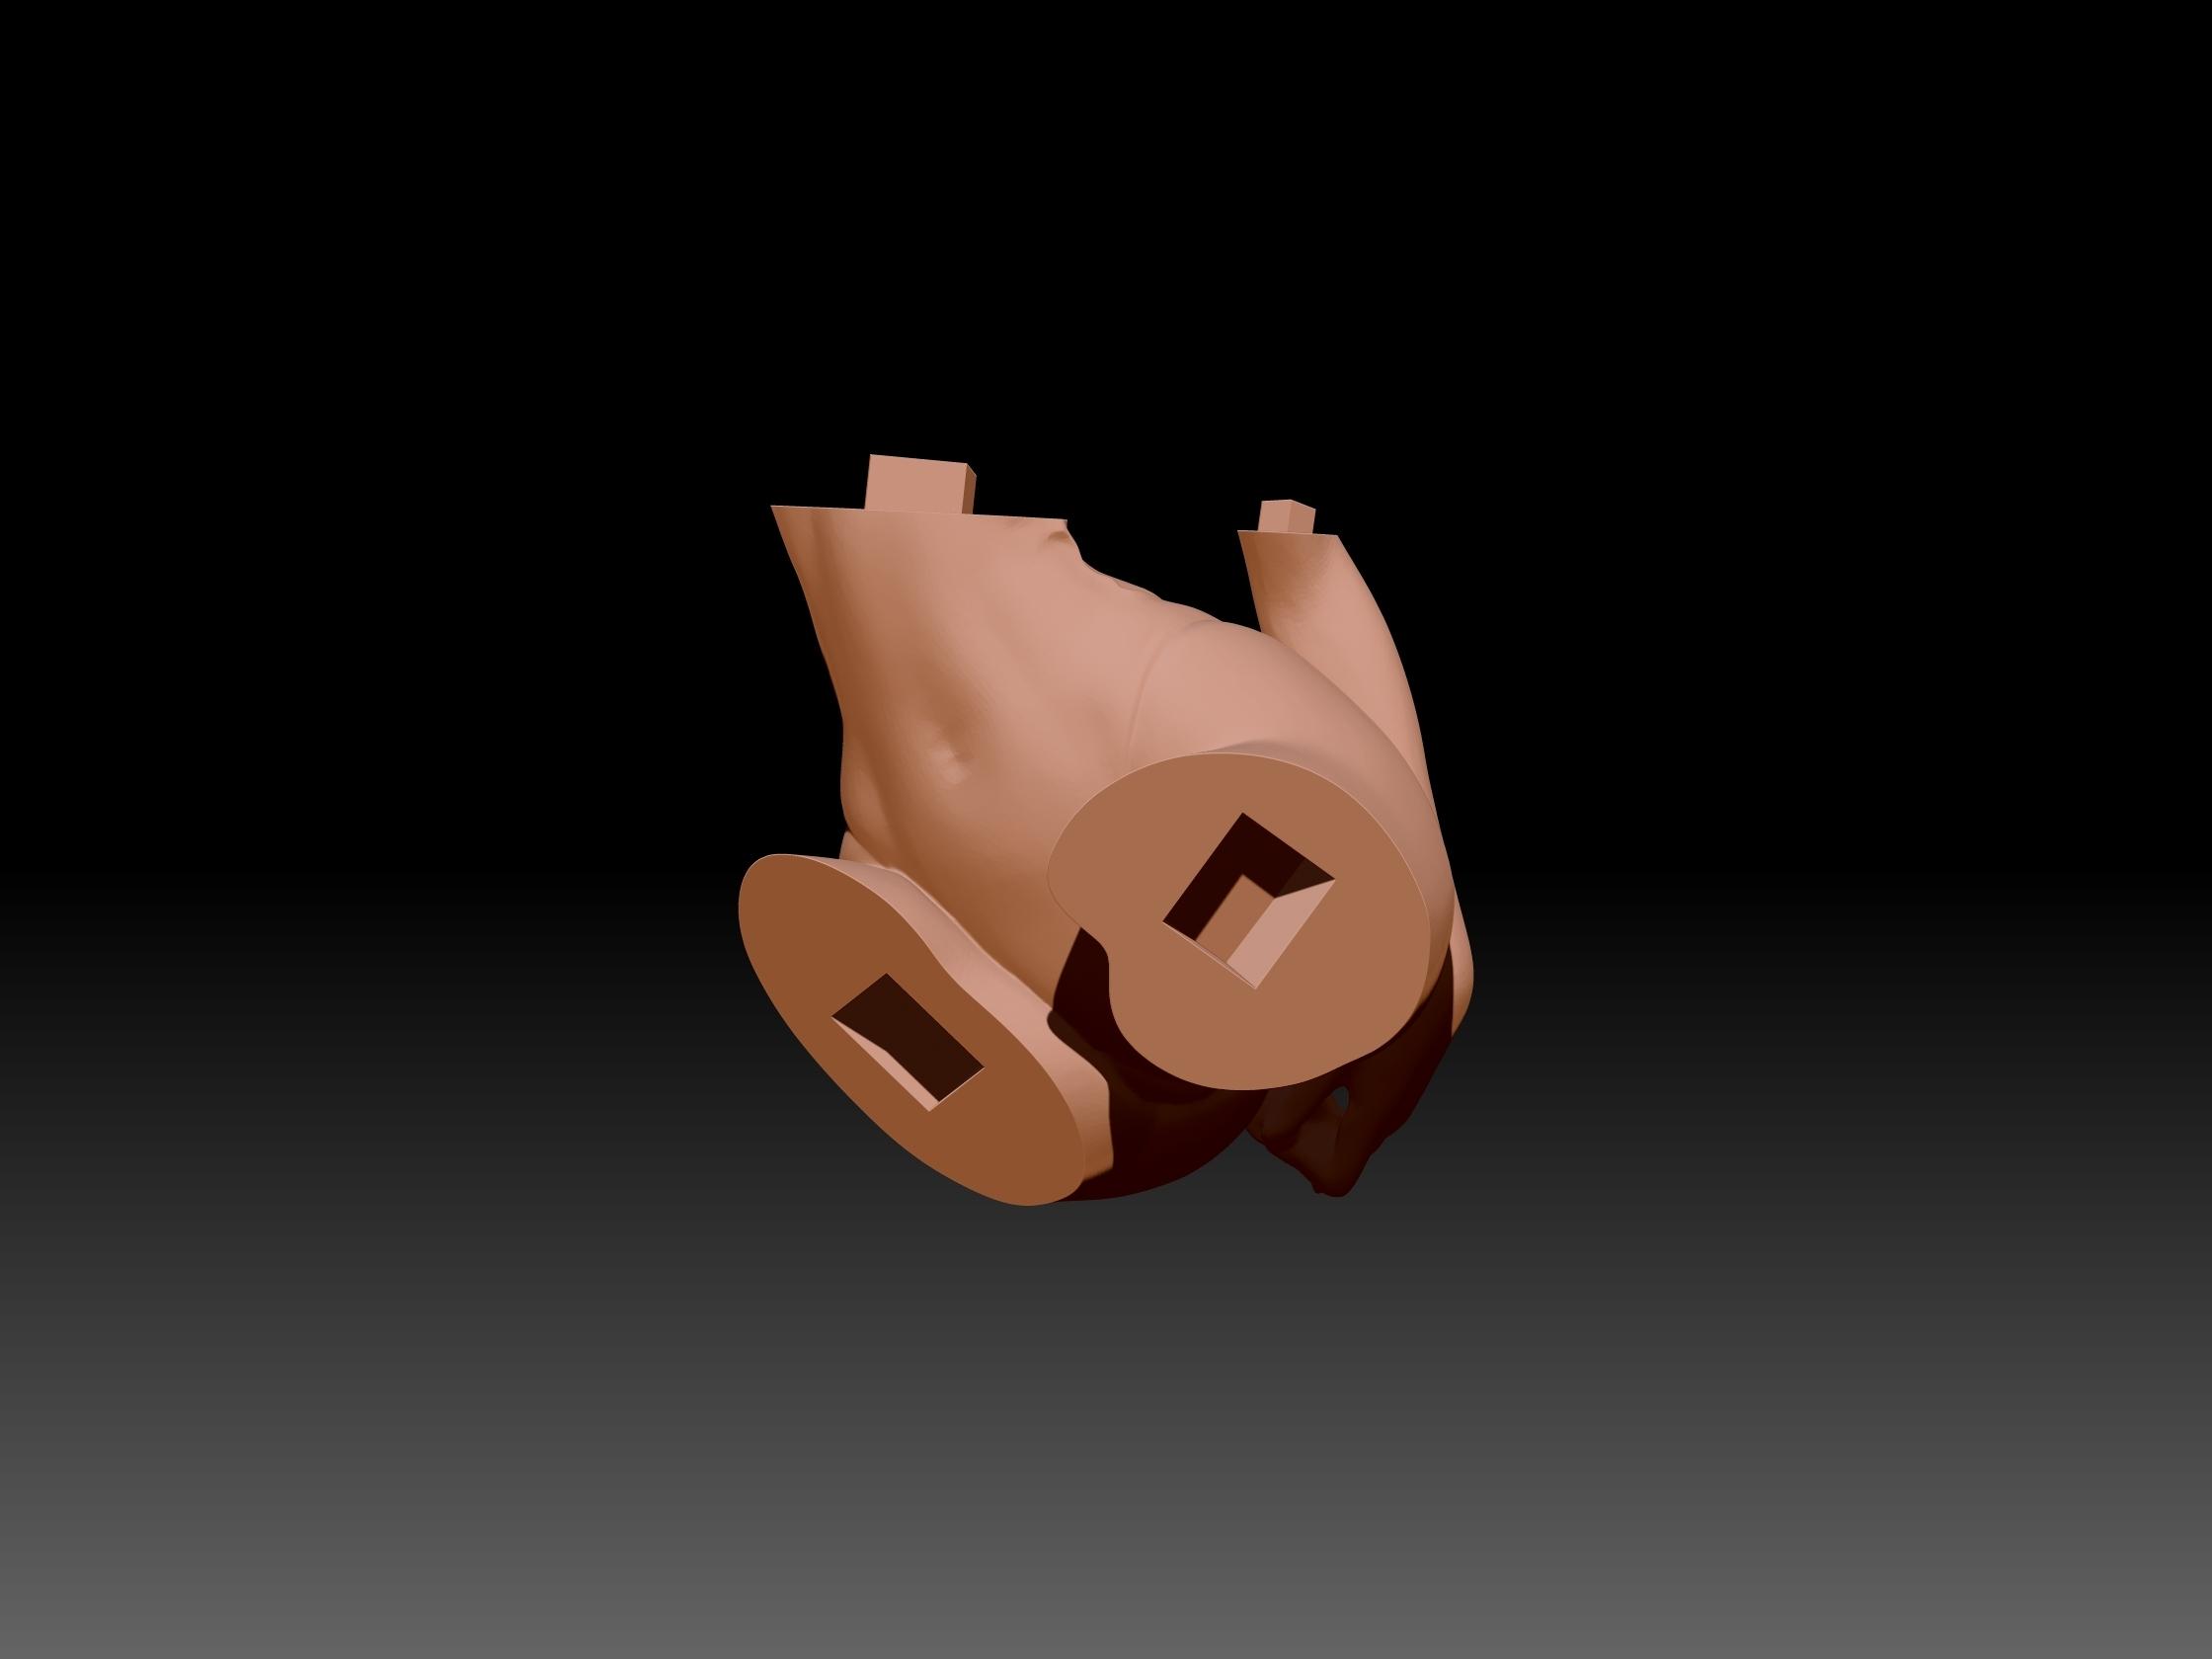 ZBrush Document4.jpg Download STL file one piece tashigi • Design to 3D print, Geraldart